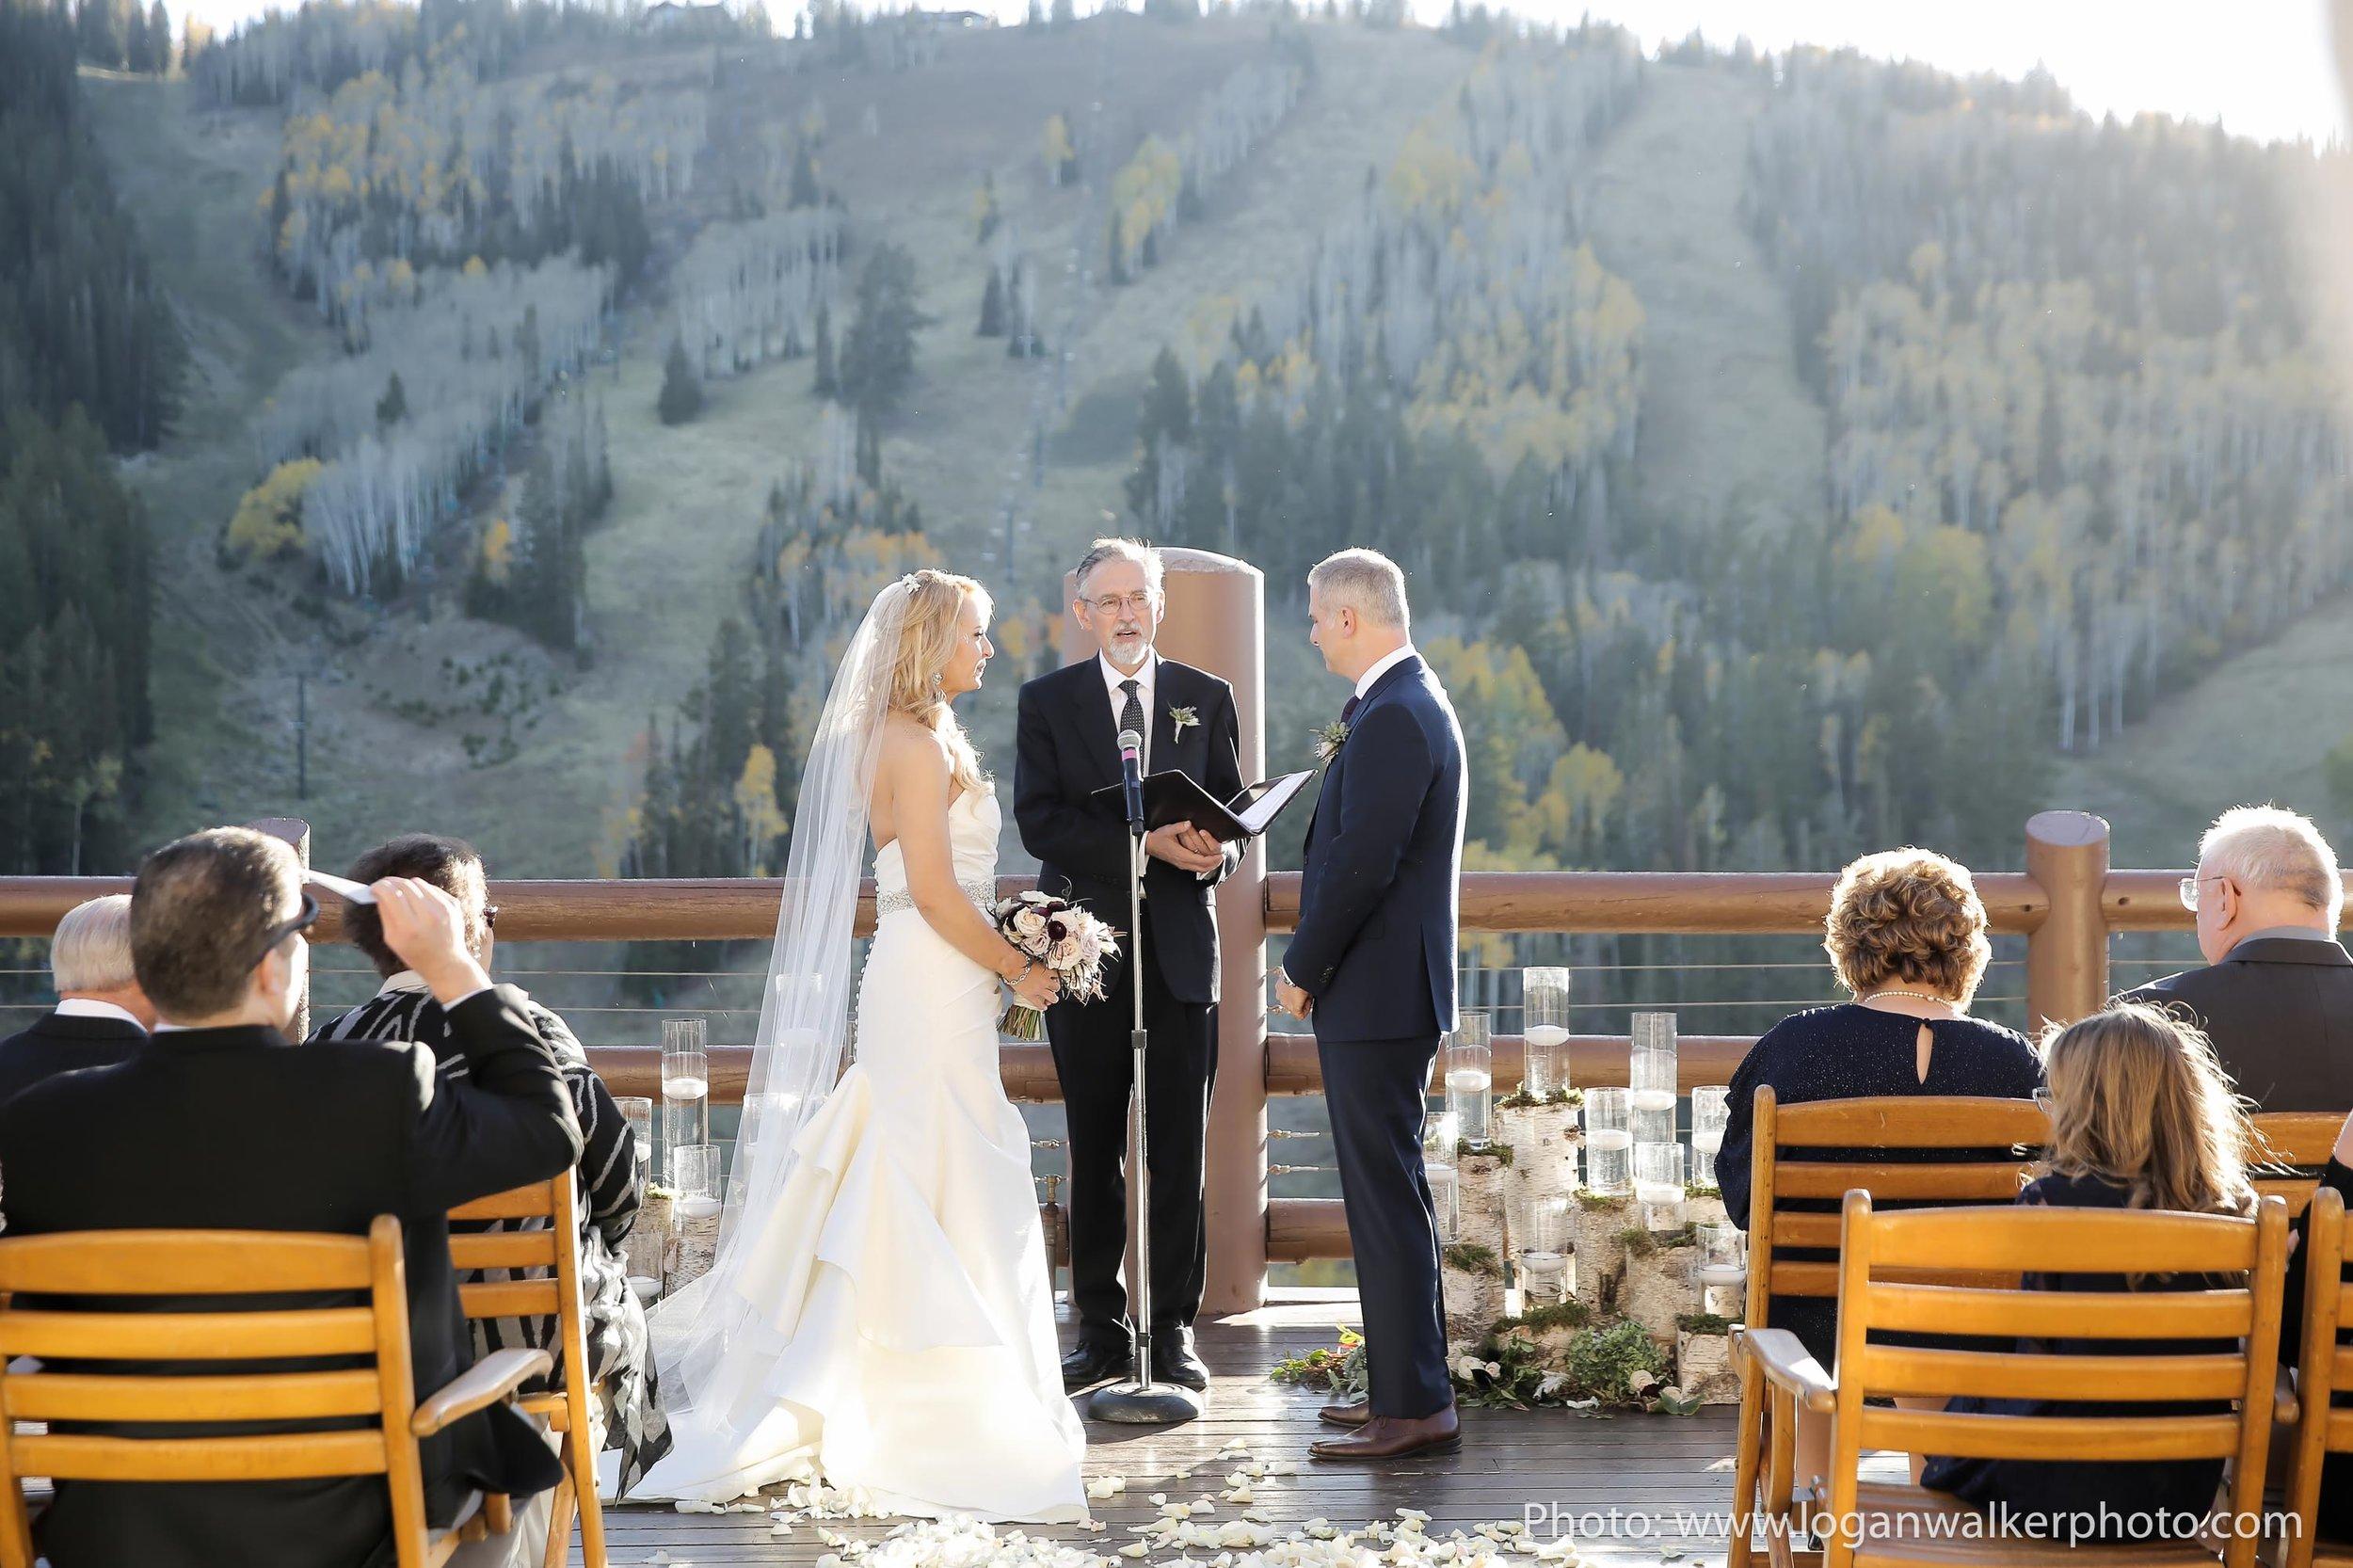 Fall Weddings Park City Stein Eriksen Lodge-0530.jpg